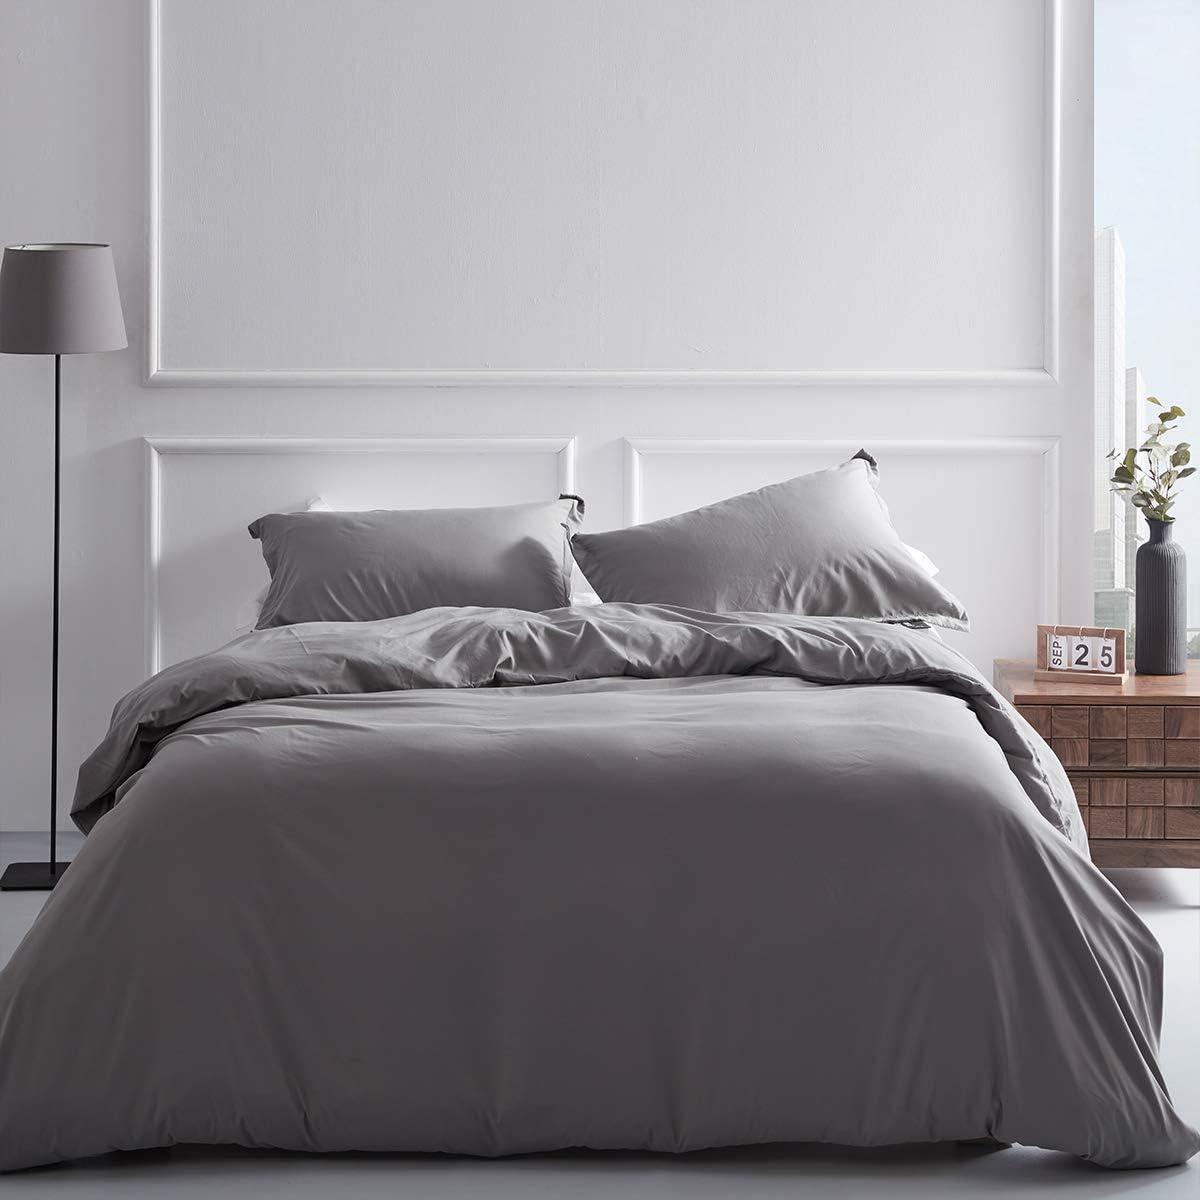 Elcherthe Duvet Cover Set Queen Size, 100% Double Brushed Microfiber 3-Piece Bedding Set(1 Duvet Cover + 2 Pillow Shams), Machine Washable with Button Closure & Corner Ties(Light Grey, 90x90Inches)